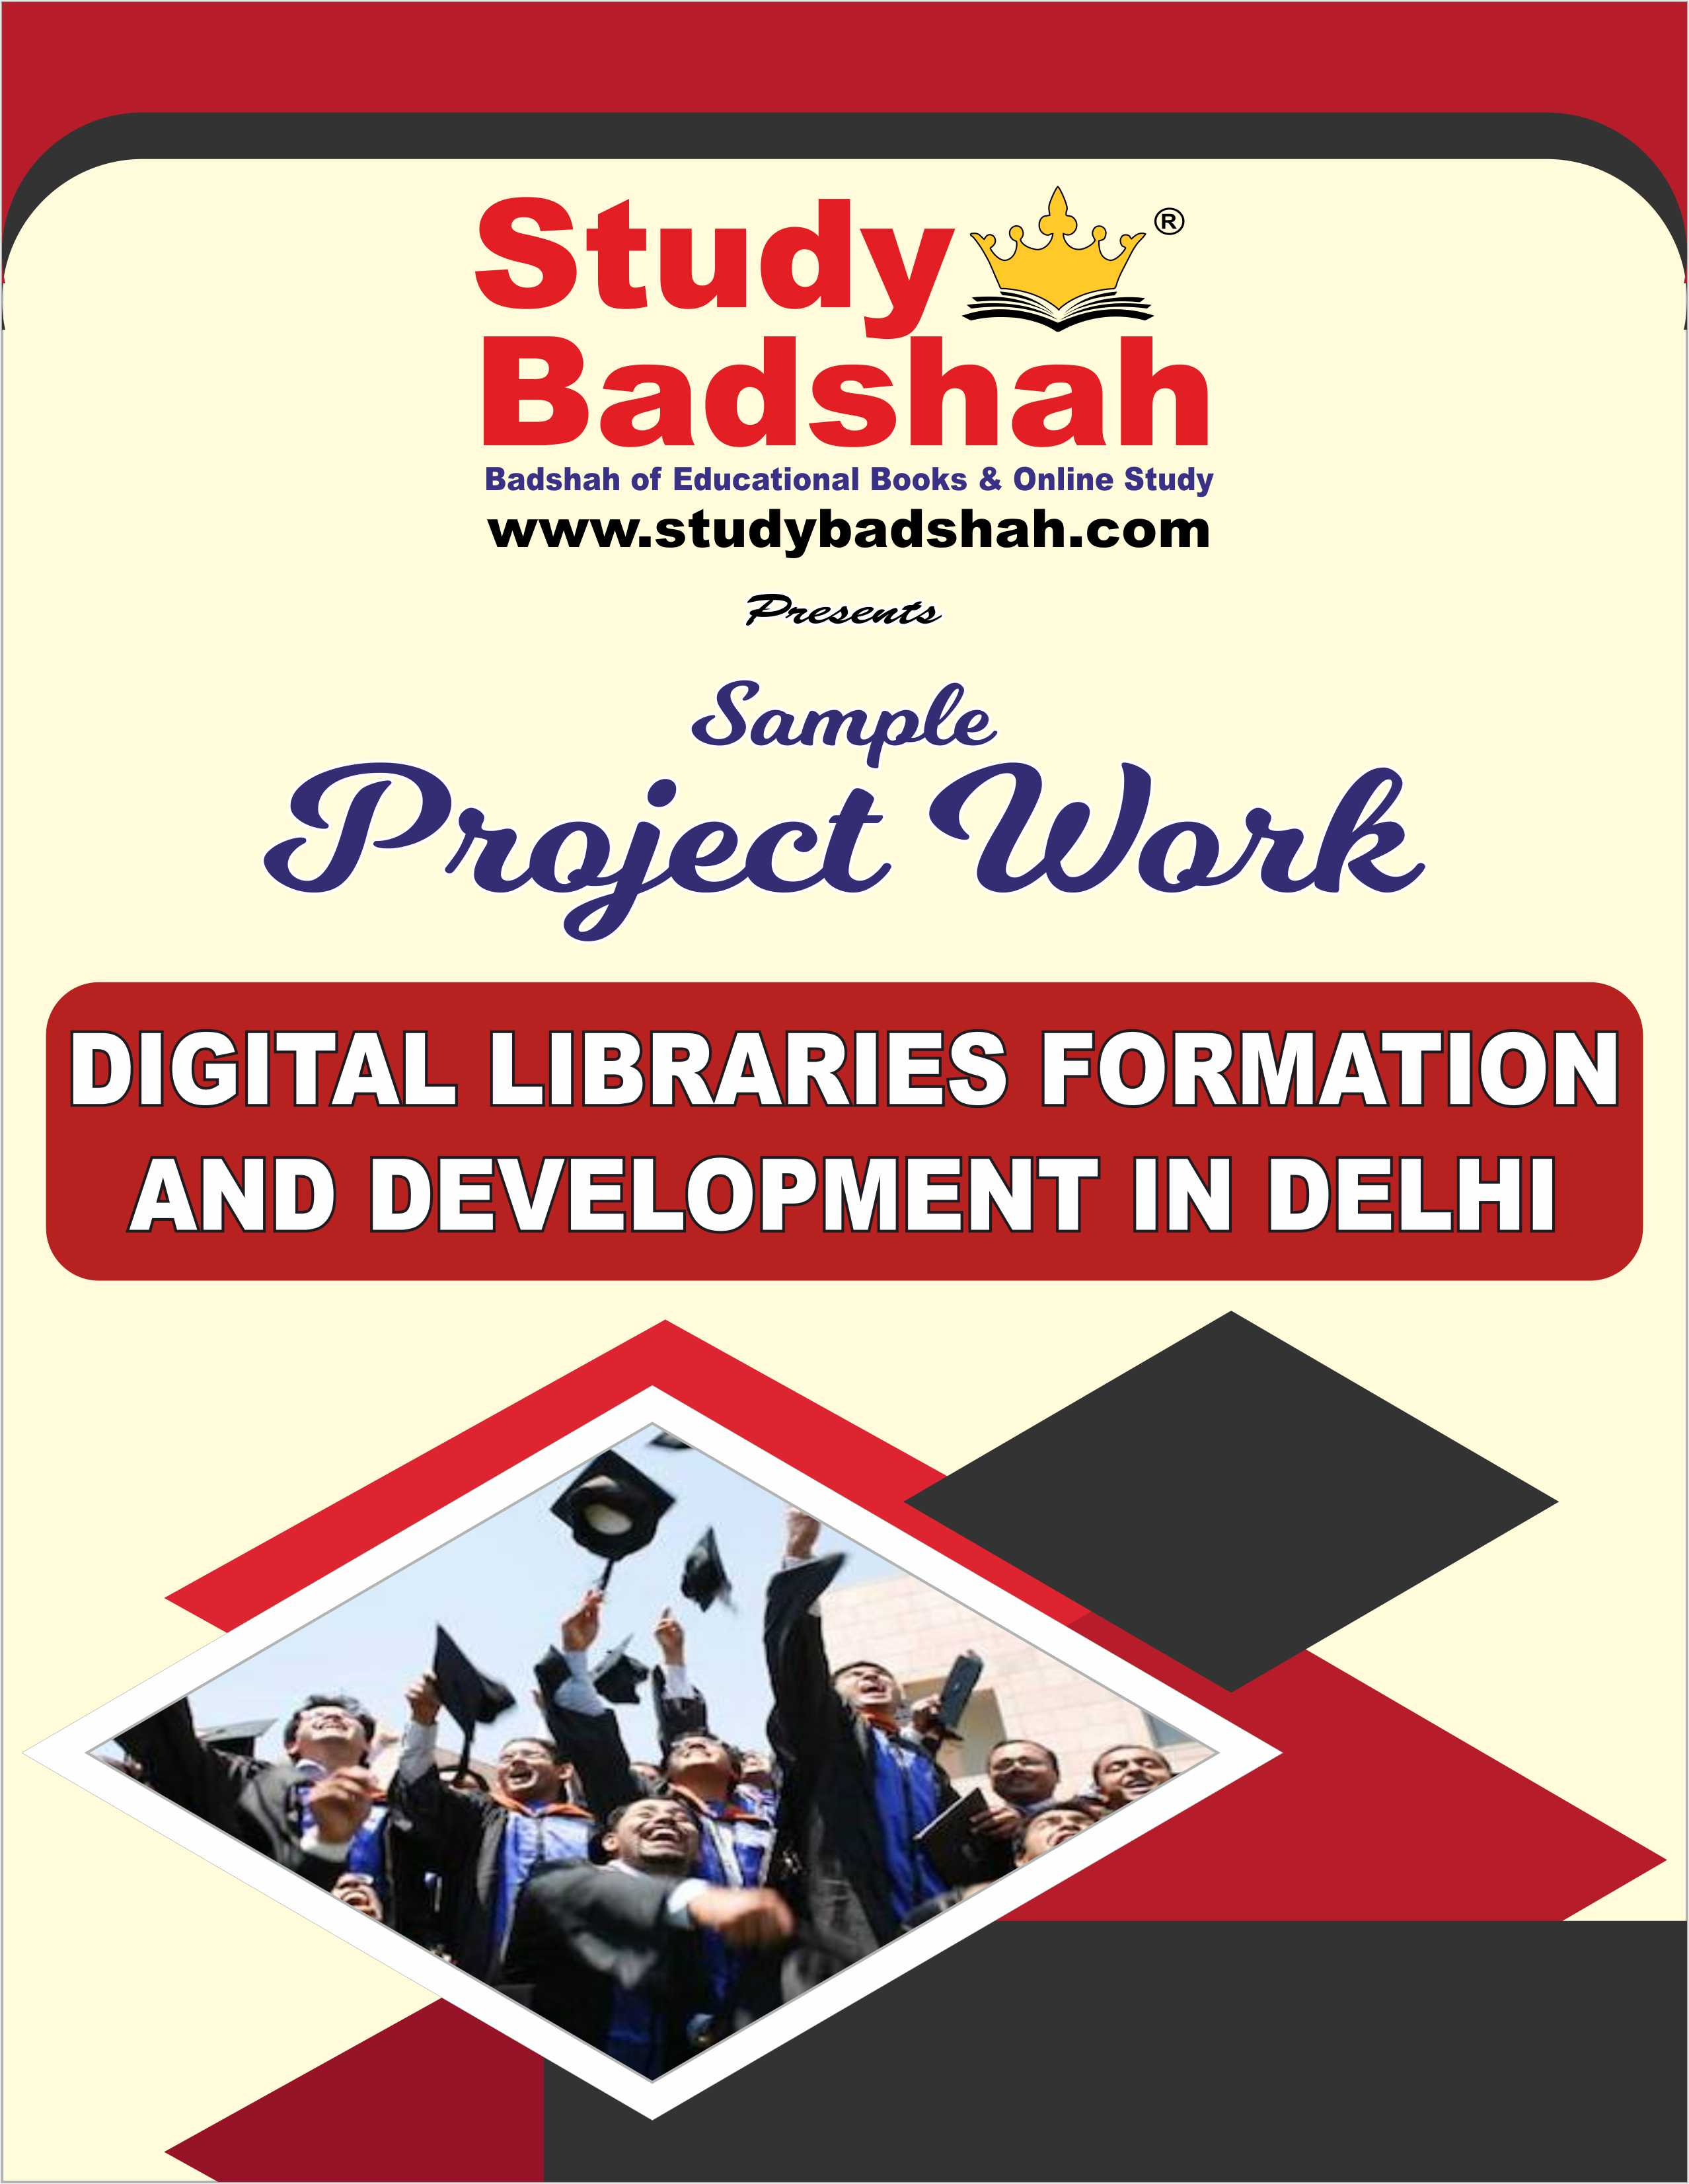 Digital Libraries Formation and Development in Delhi